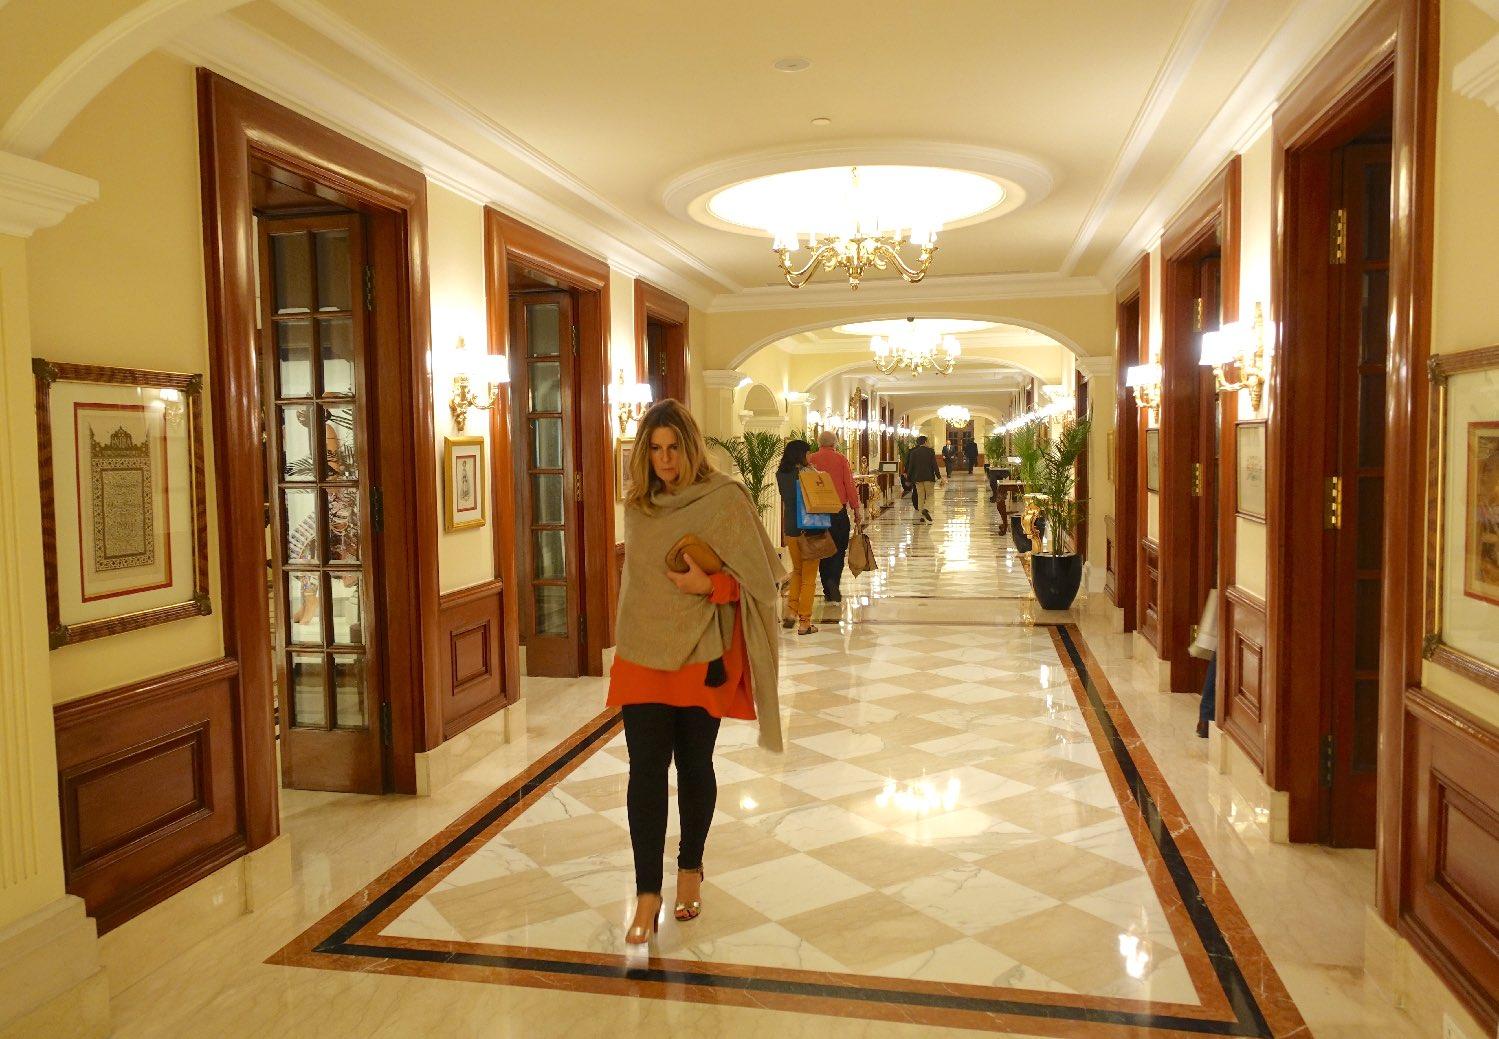 New Delhi | The Imperial Hotel | The Imperial New Delhi | Shops | Taj group | ©sandrine cohen